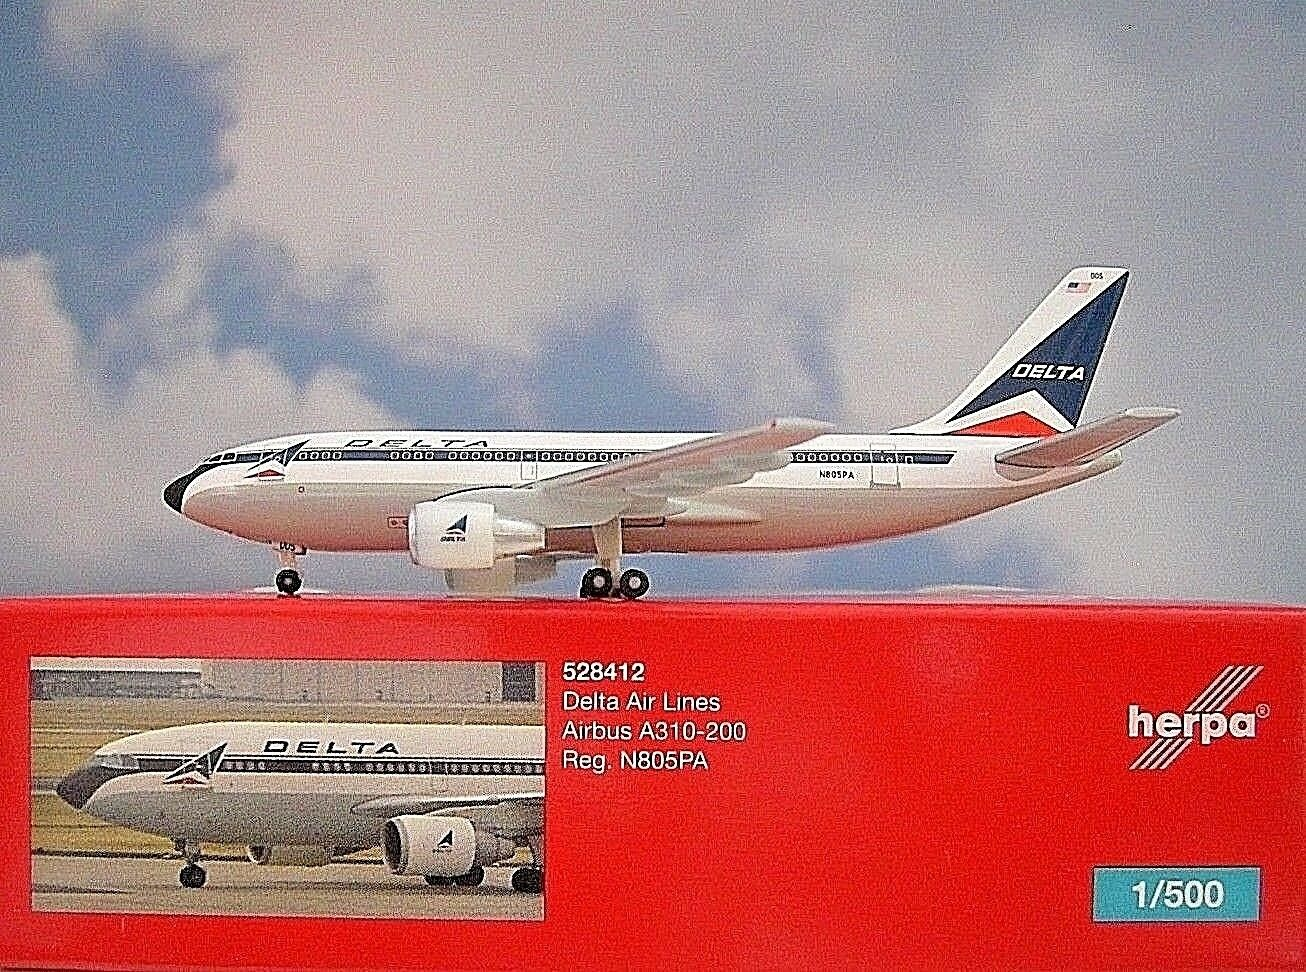 Herpa Herpa Herpa Wings 1 500 Airbus A310-200  Delta Airlines N805PA 528412 Modellairport500    Ausgezeichnet  dbddba